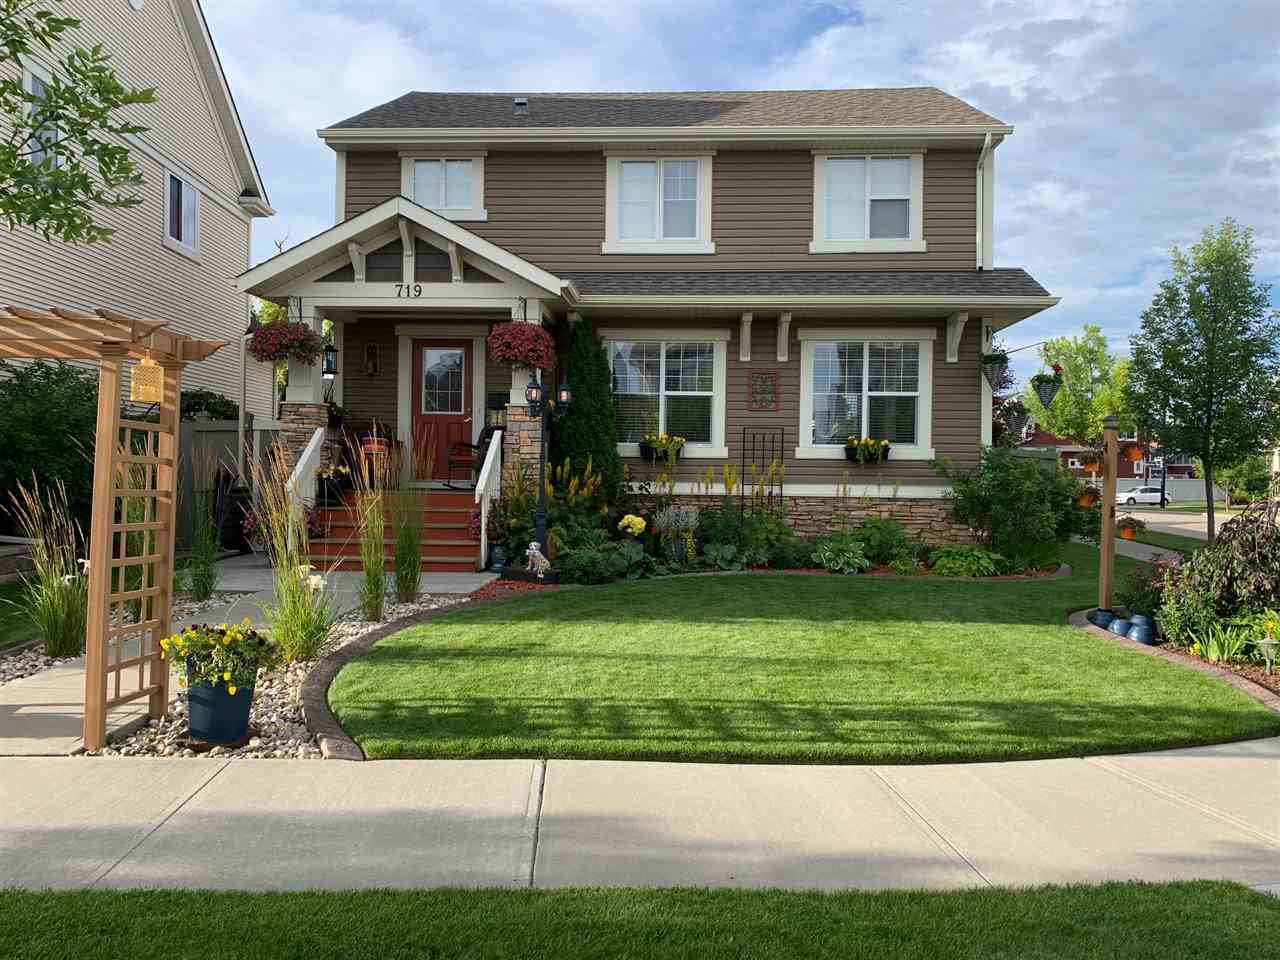 Main Photo: 719 DECOTEAU Way in Edmonton: Zone 27 House for sale : MLS®# E4209595